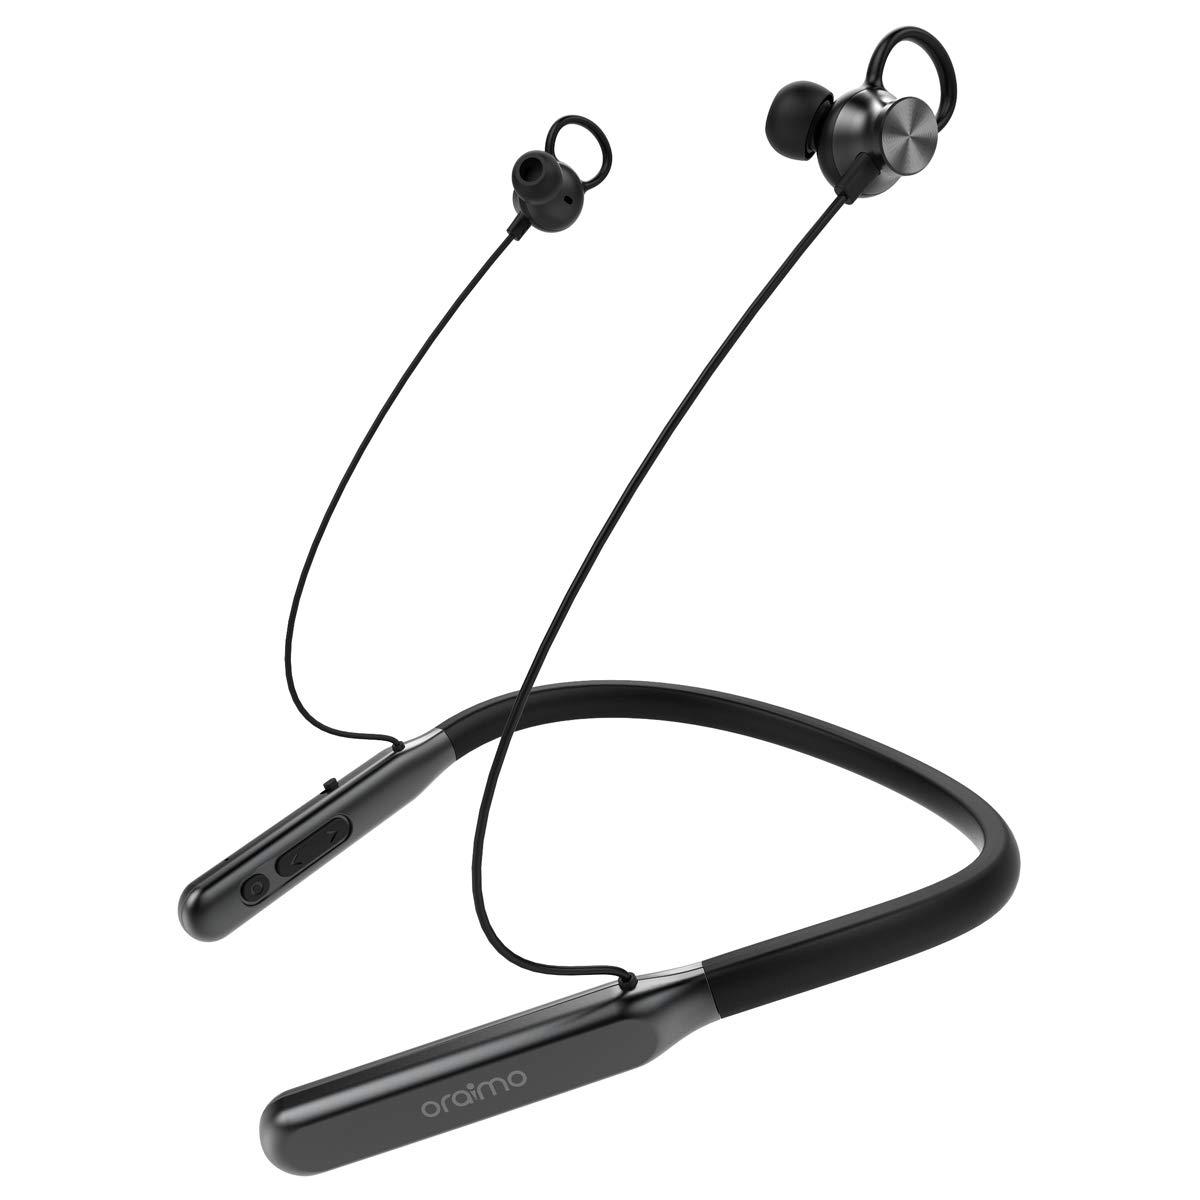 Oraimo Necklace 2 (E74D) Wireless Neckband Earphone